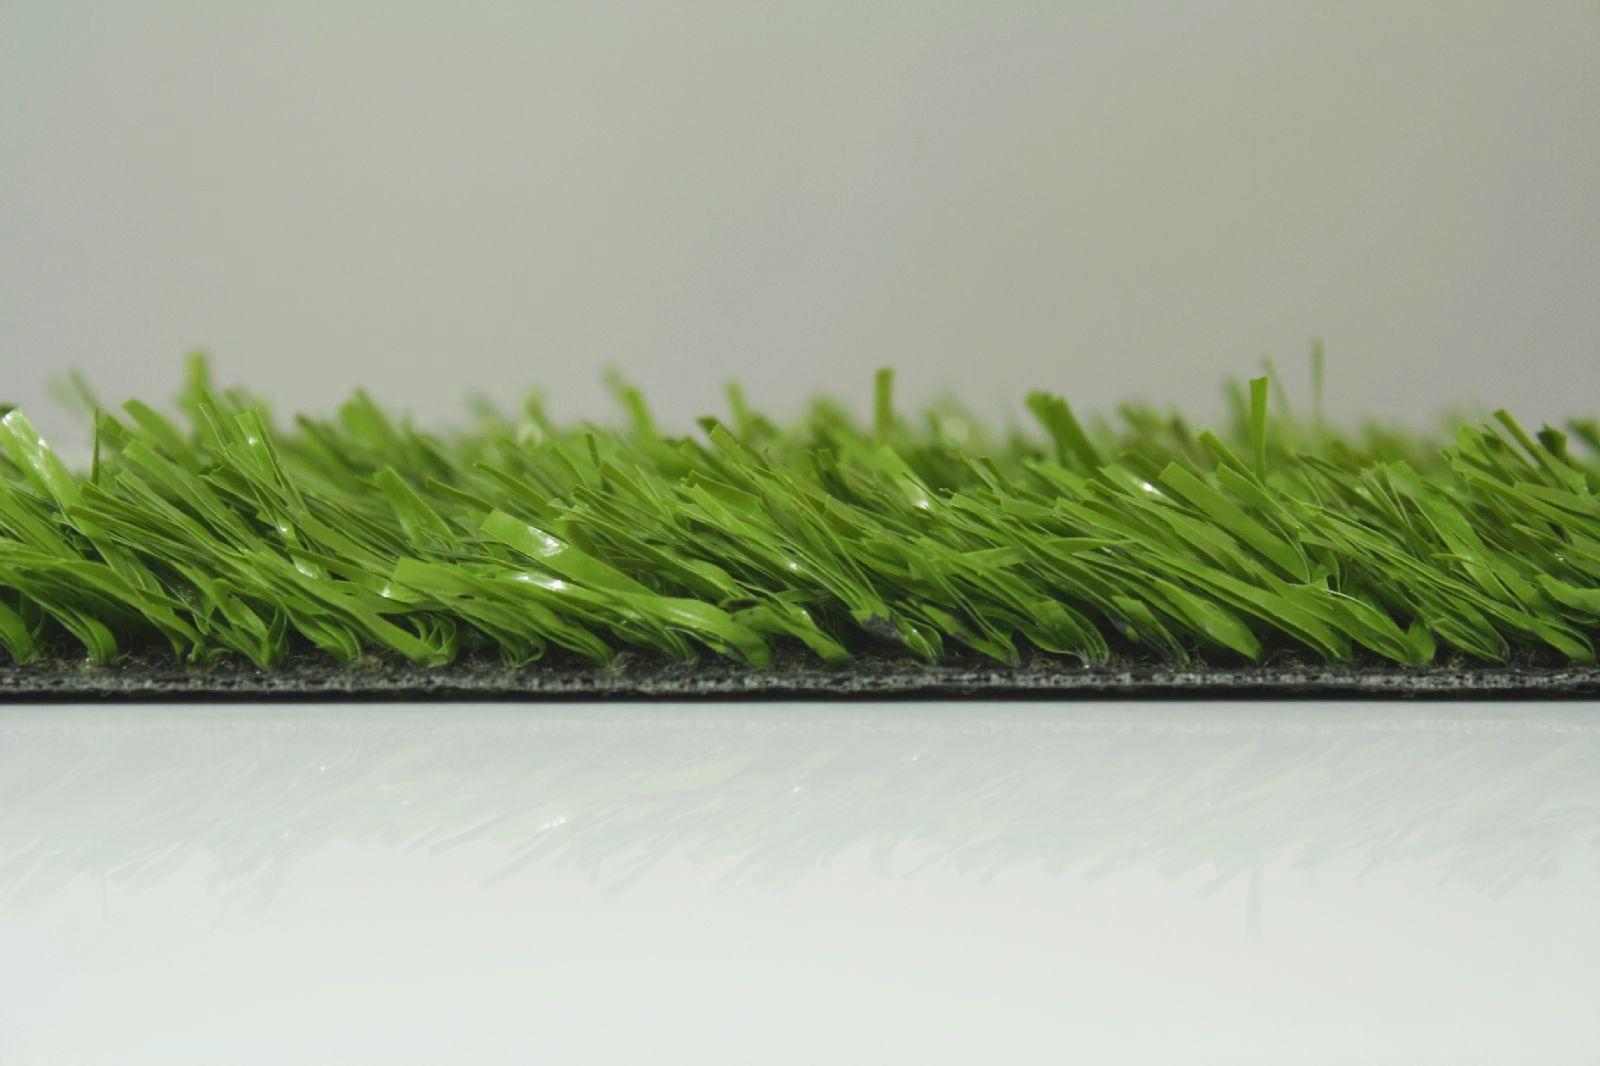 kunstrasen rasenteppich champion verde versch gr en s1. Black Bedroom Furniture Sets. Home Design Ideas